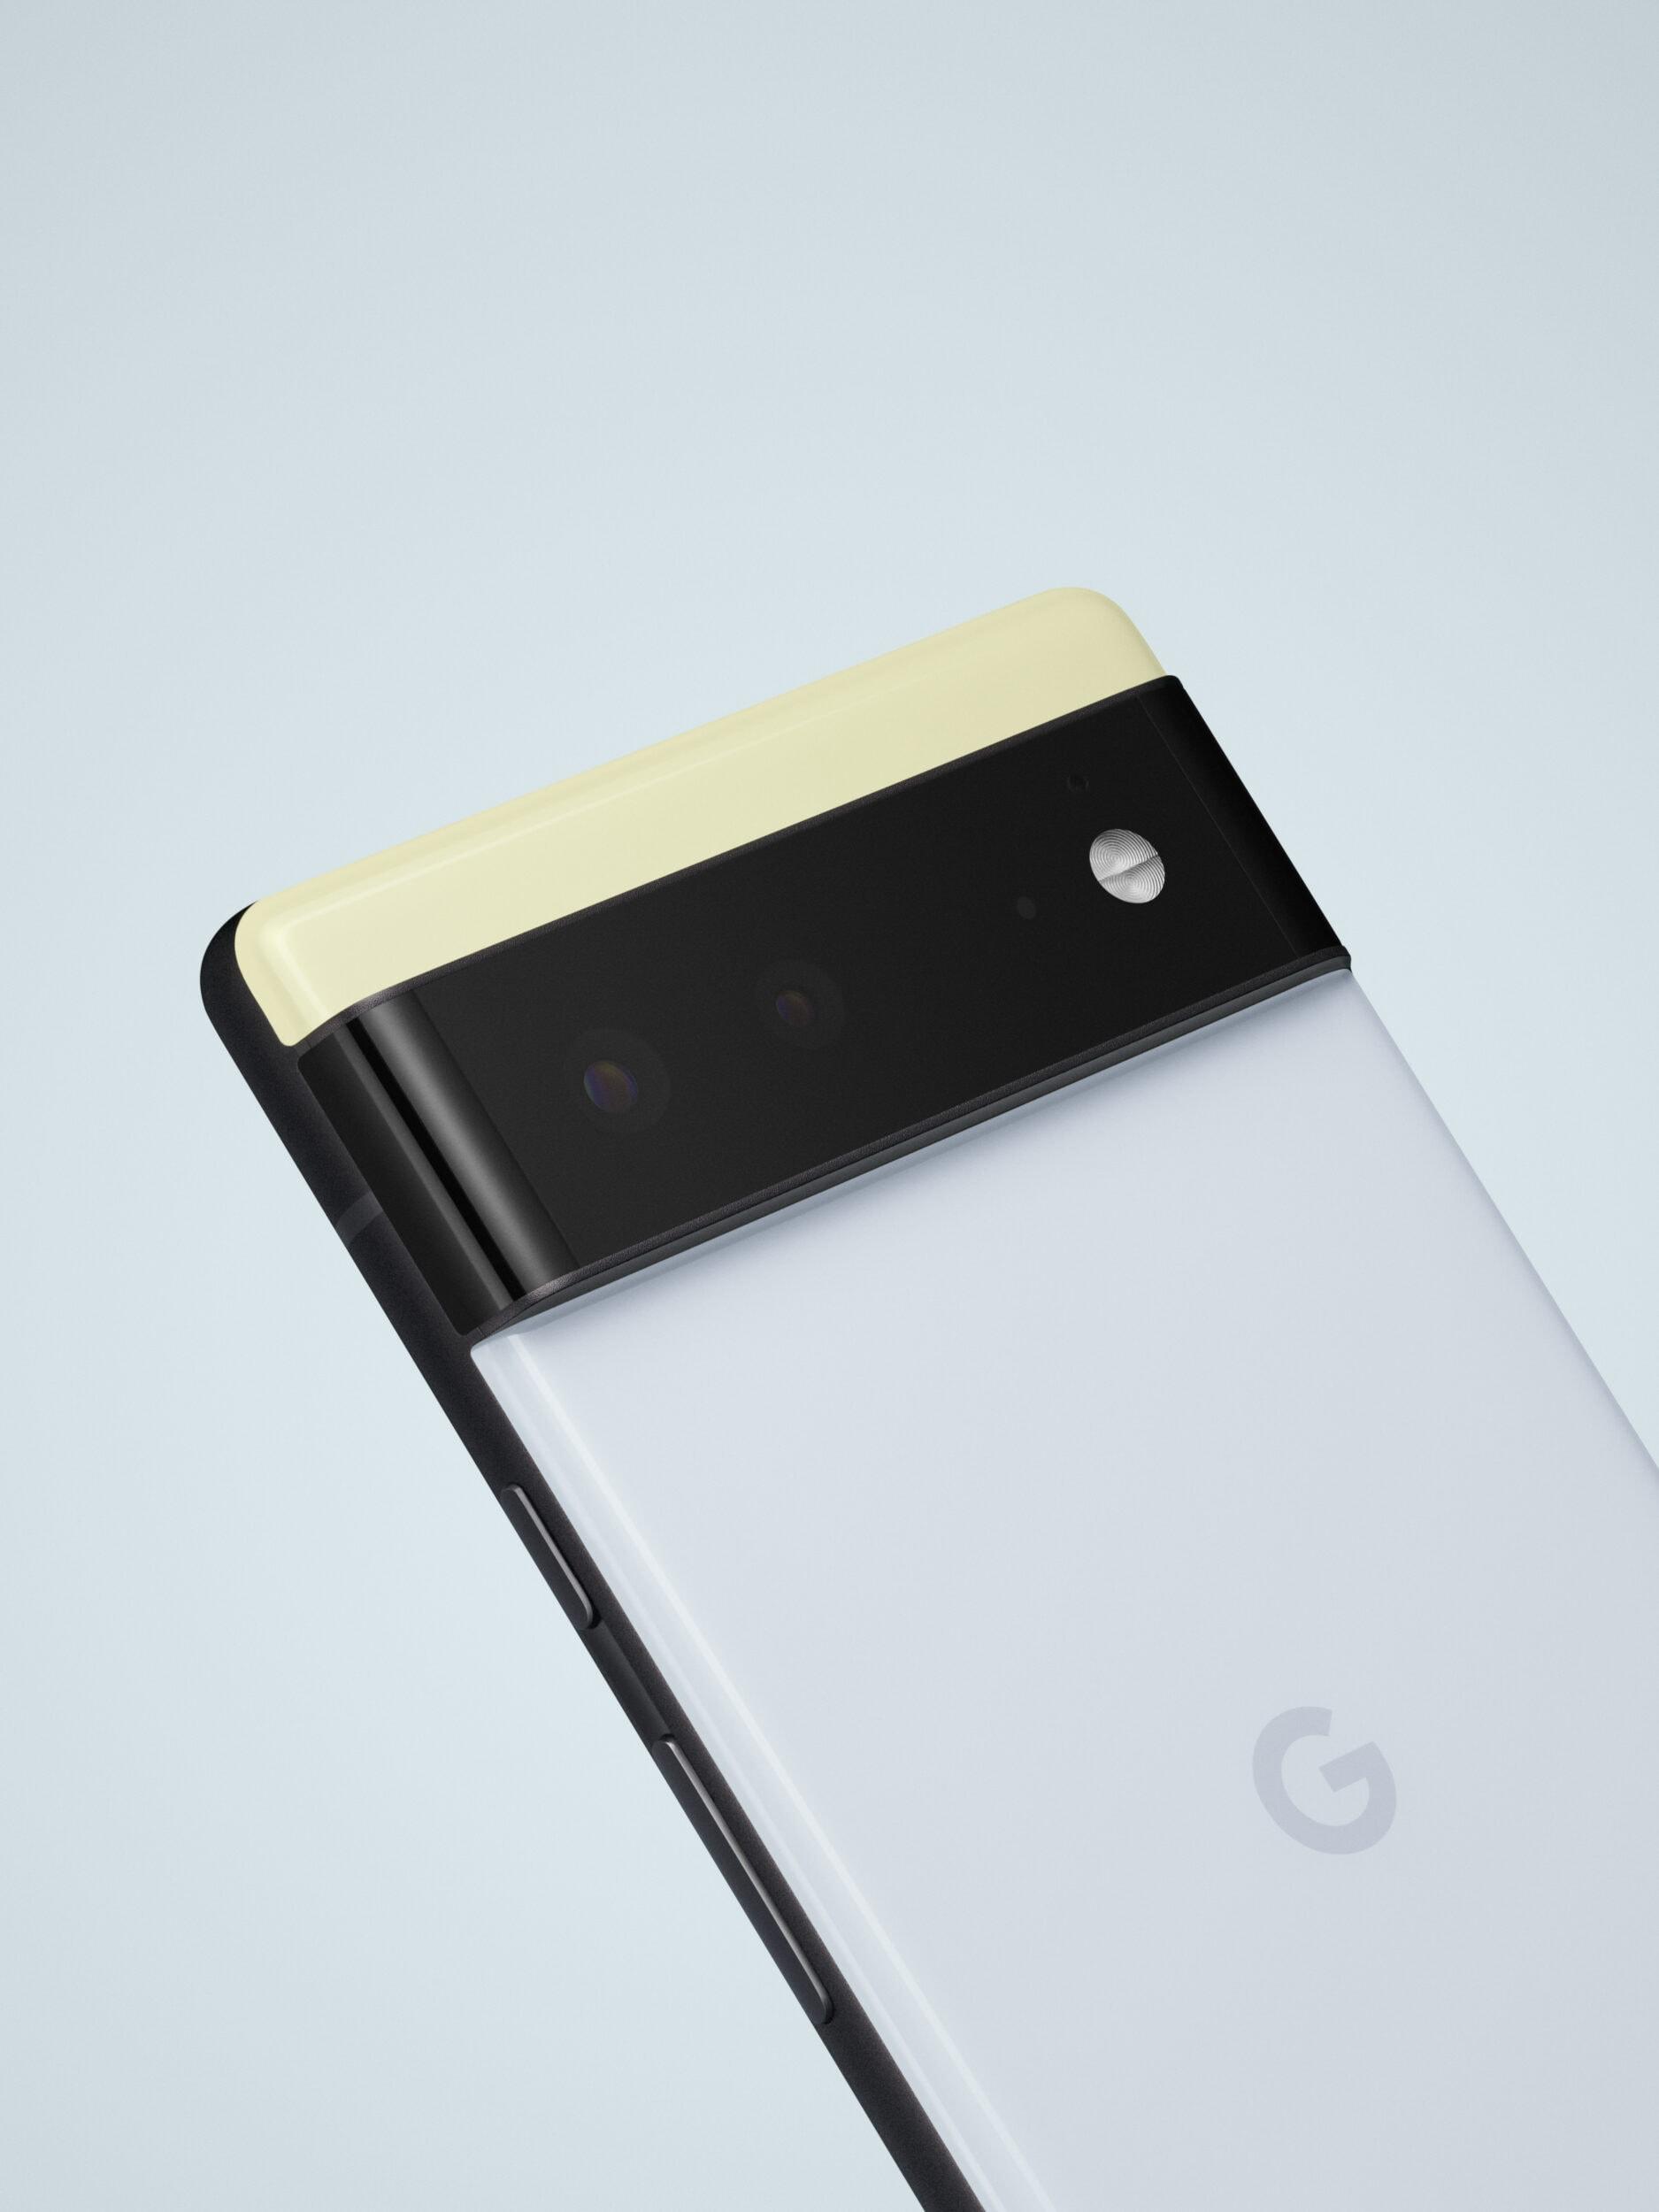 Perché Pixel 6 (Pro) sarà un mostro nella fotografia